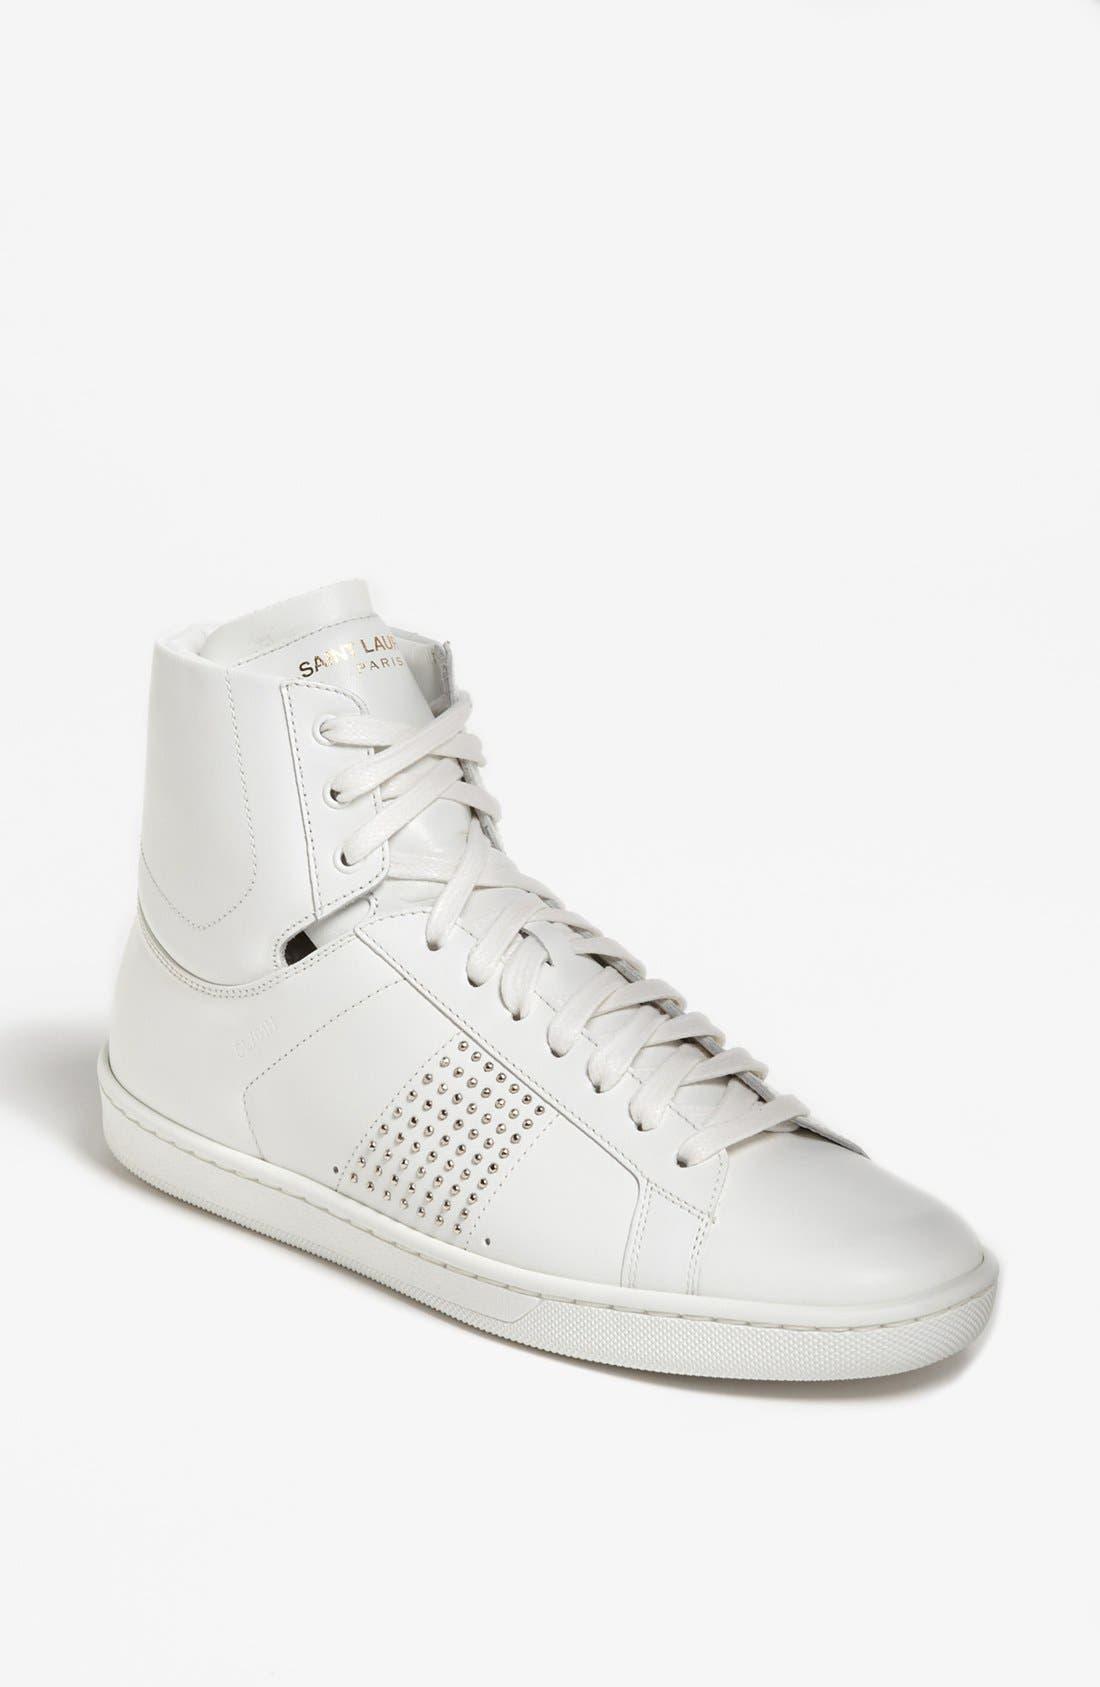 Alternate Image 1 Selected - Saint Laurent High Top Sneaker